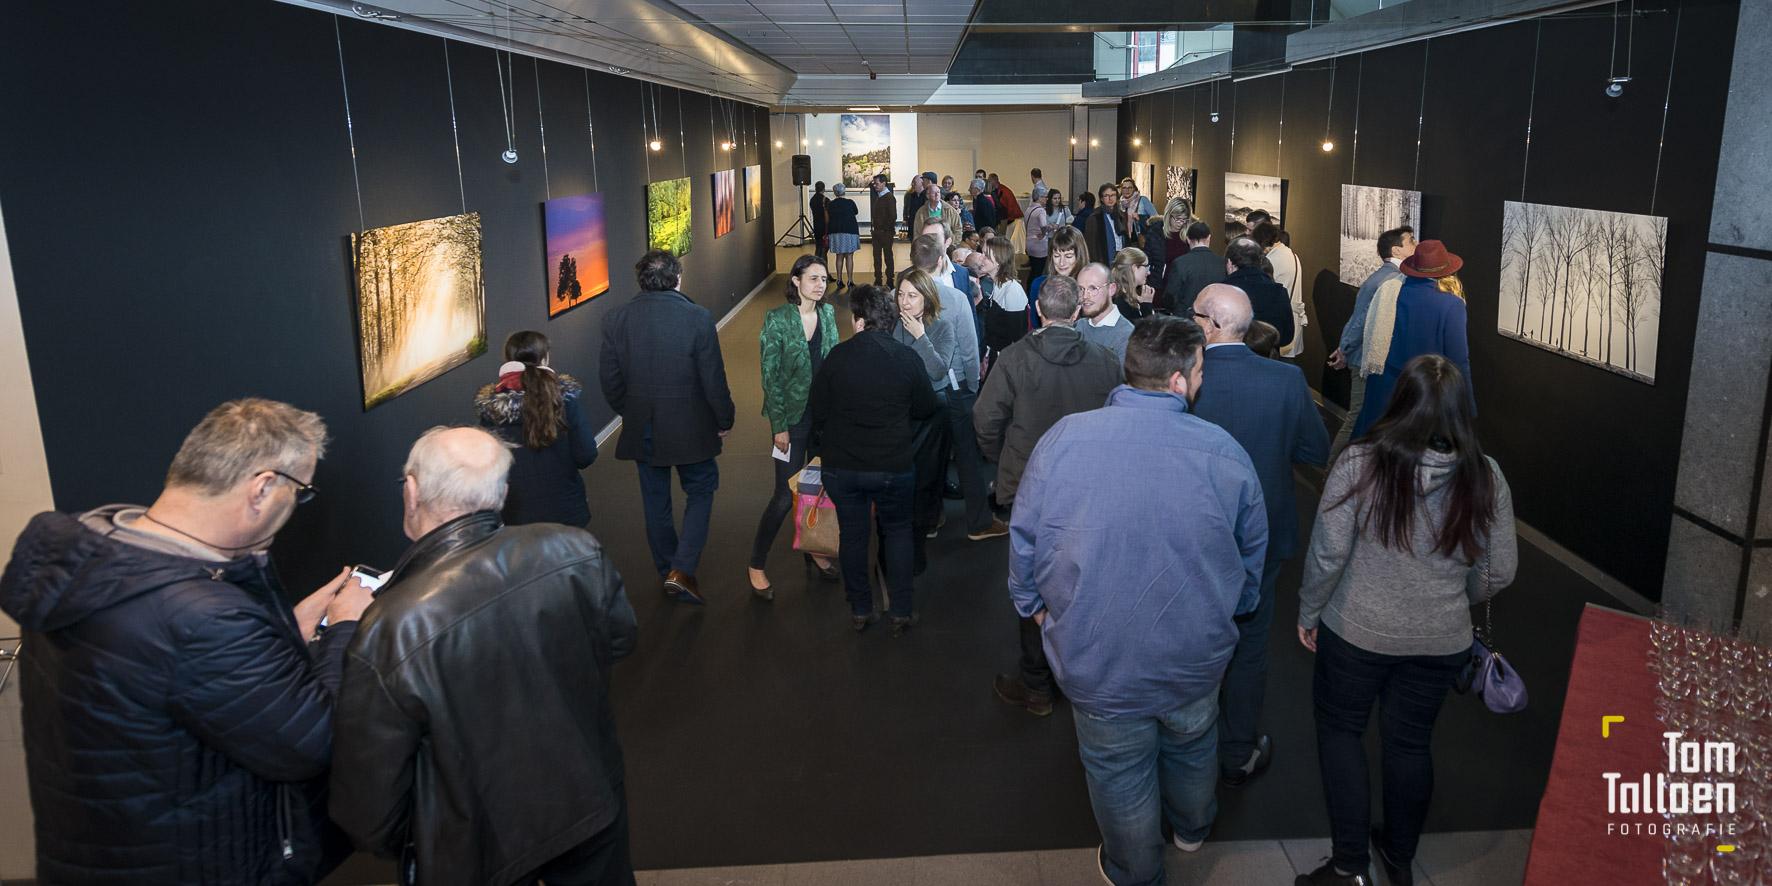 Fotografie Tom Talloen, Vernissage Glenn Vanderbeke, tentoonstelling glenn vanderbeke